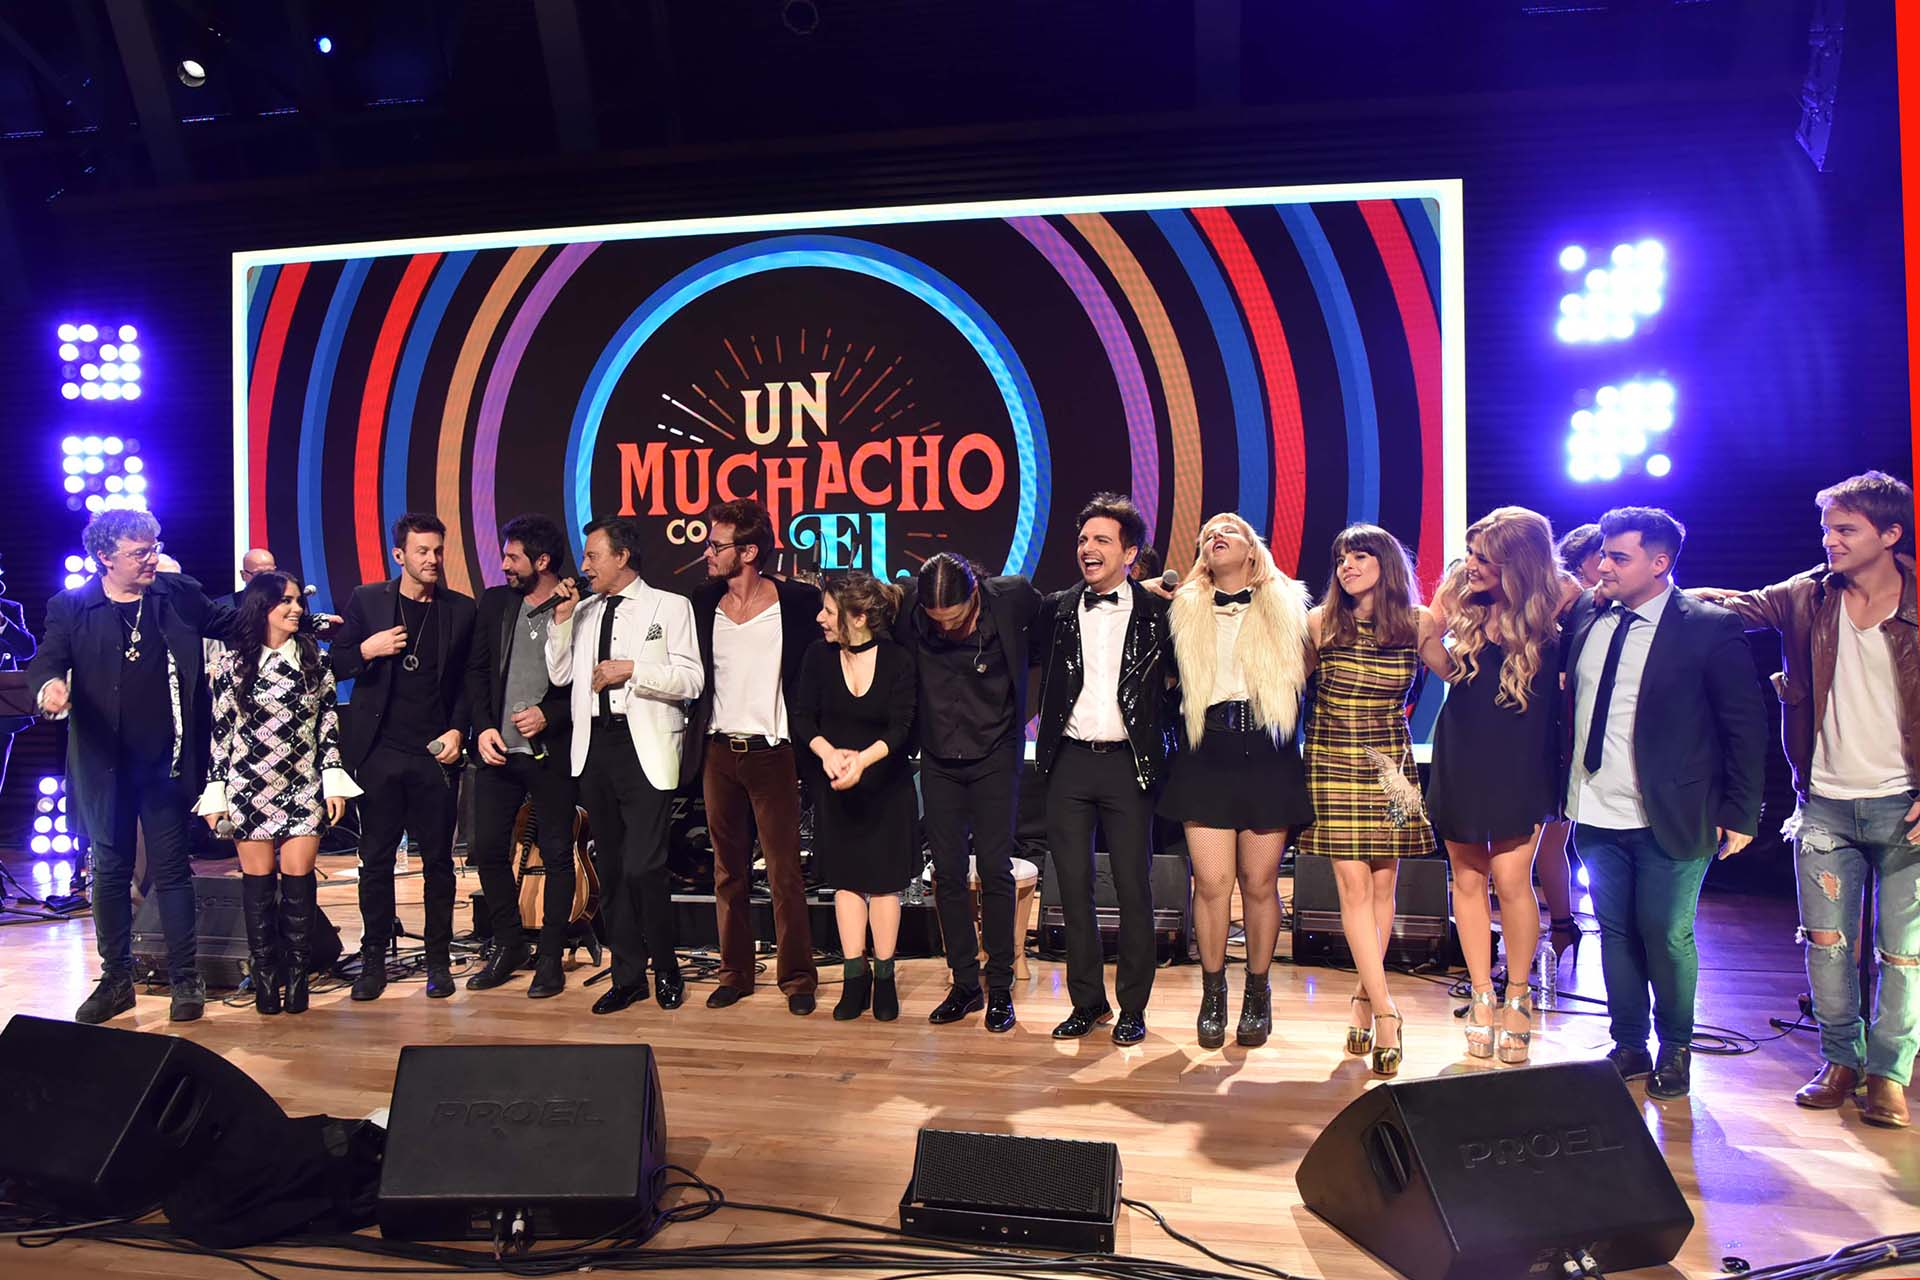 Muchos artistas cantaron para homenajear a Palito Ortega